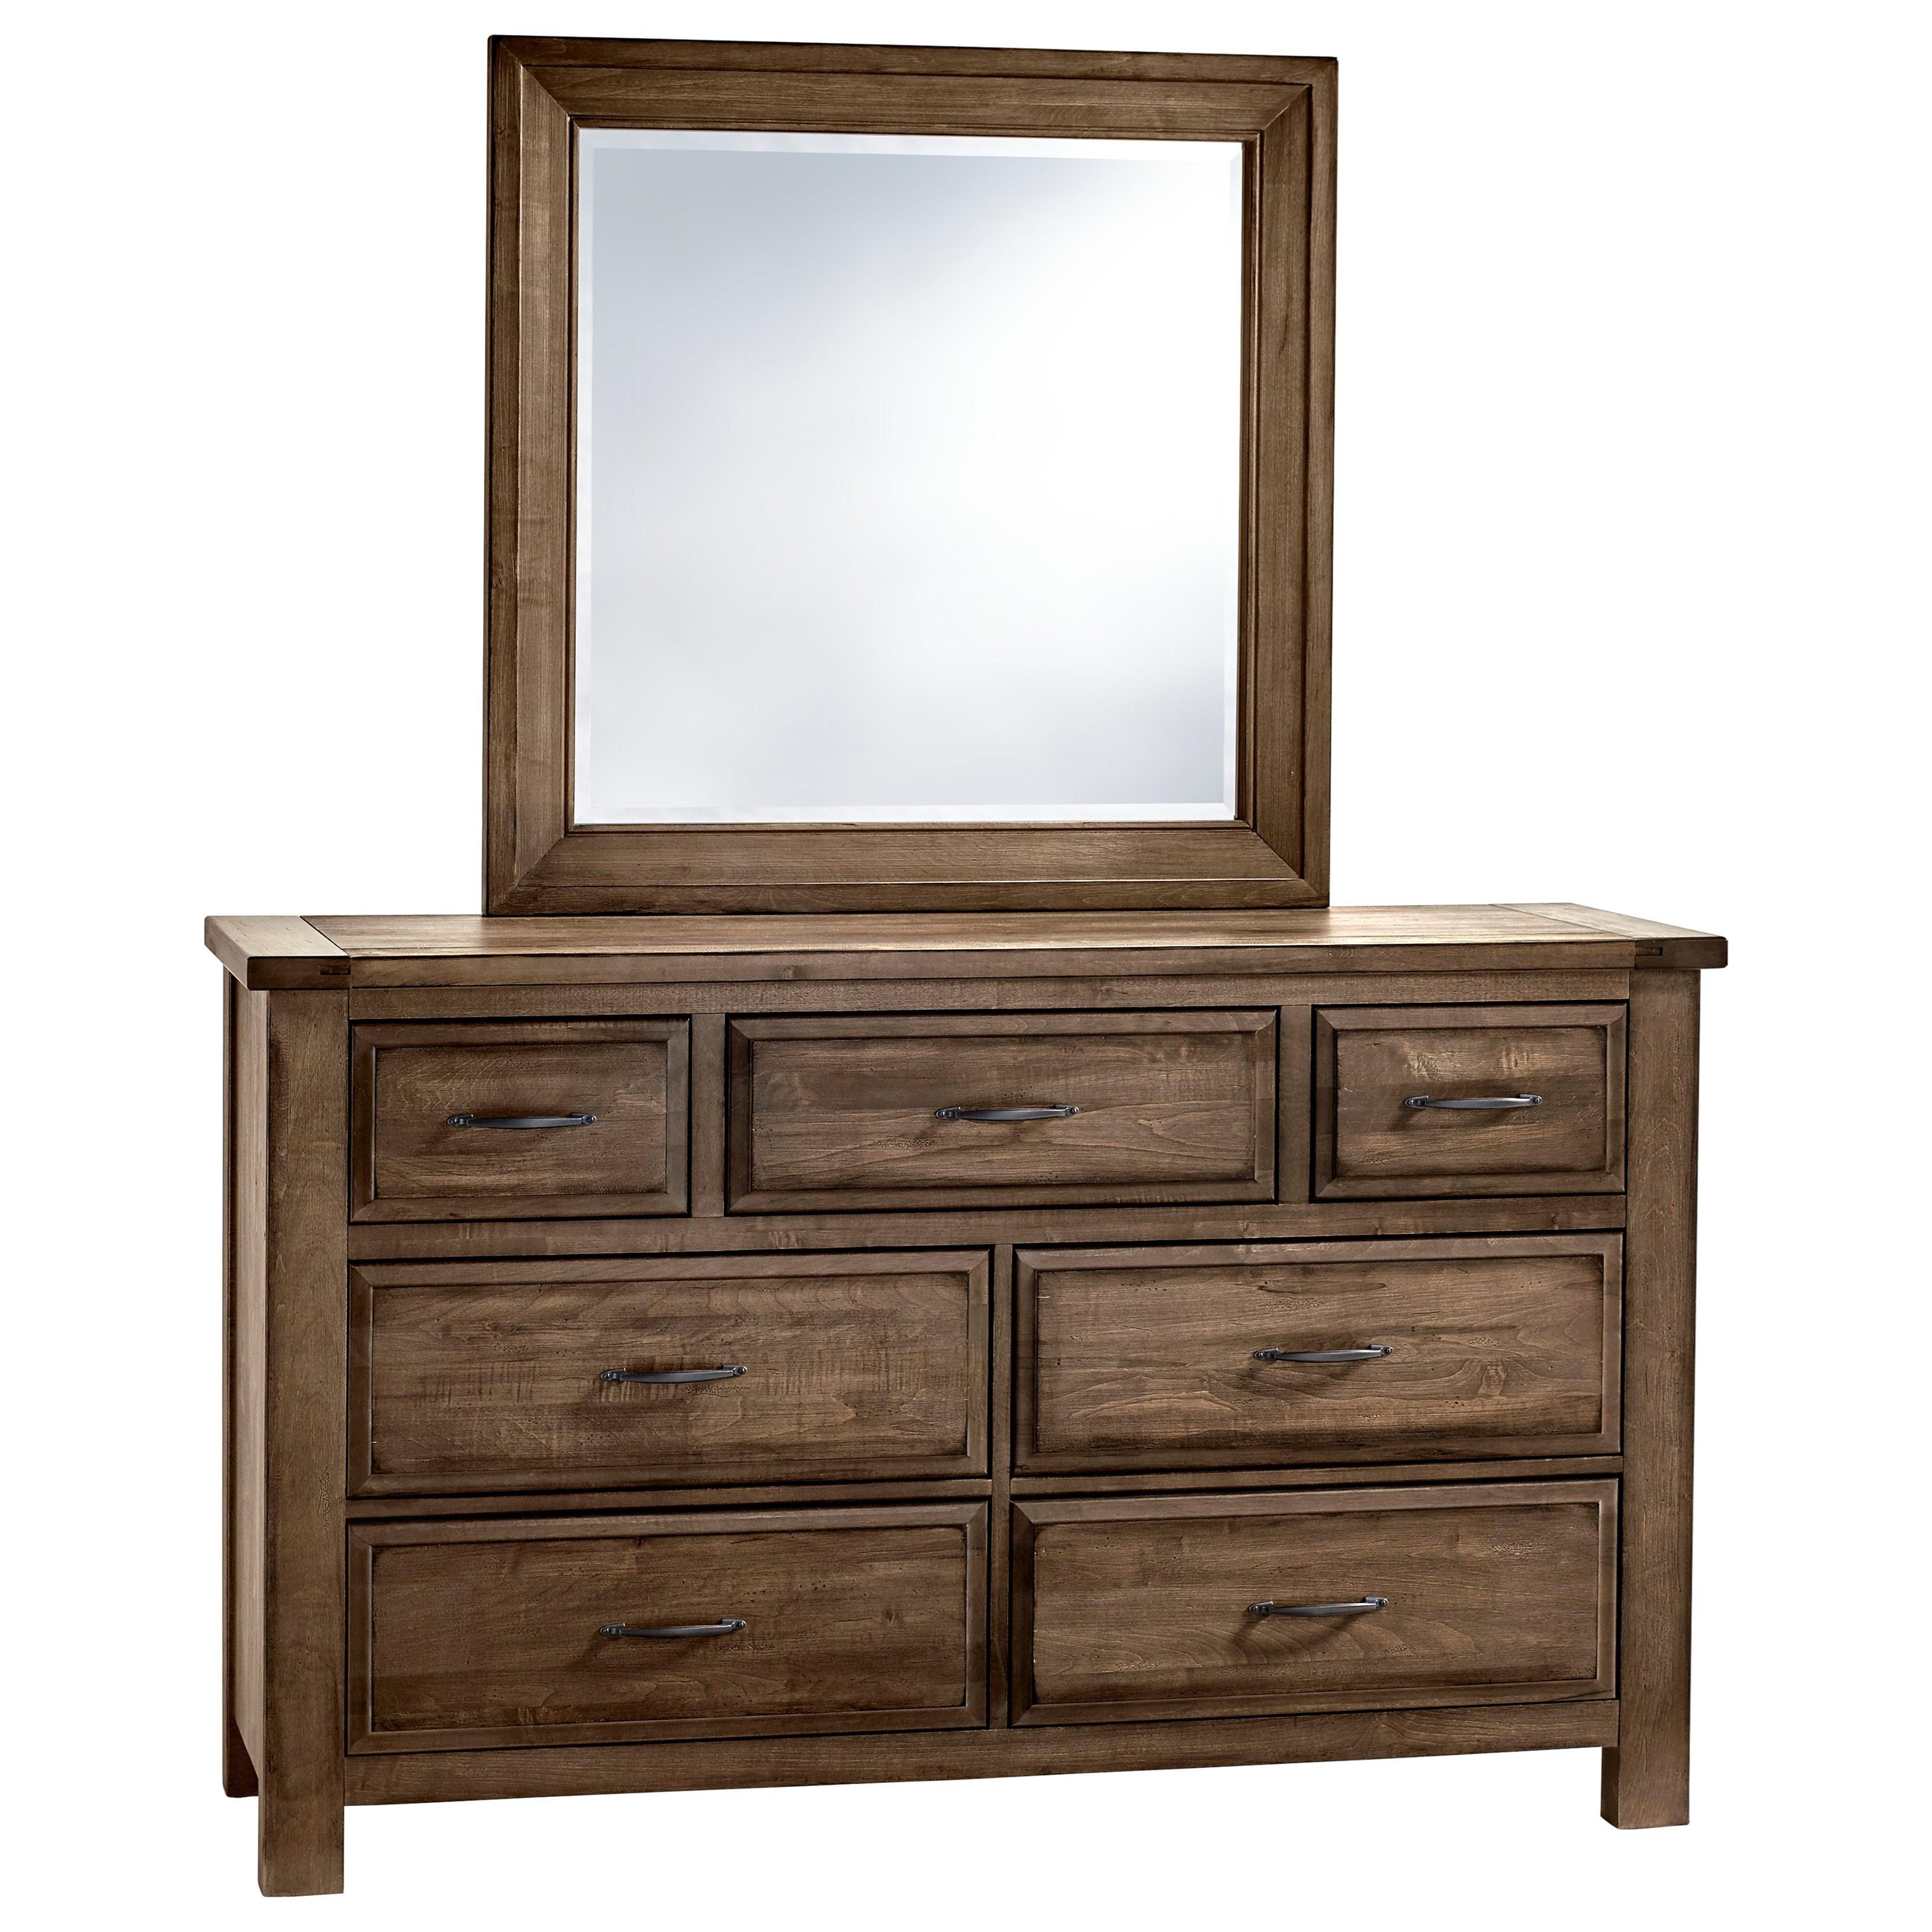 american made solid wood bedroom furniture.  American Made Solid Wood Bedroom Furniture Dresser